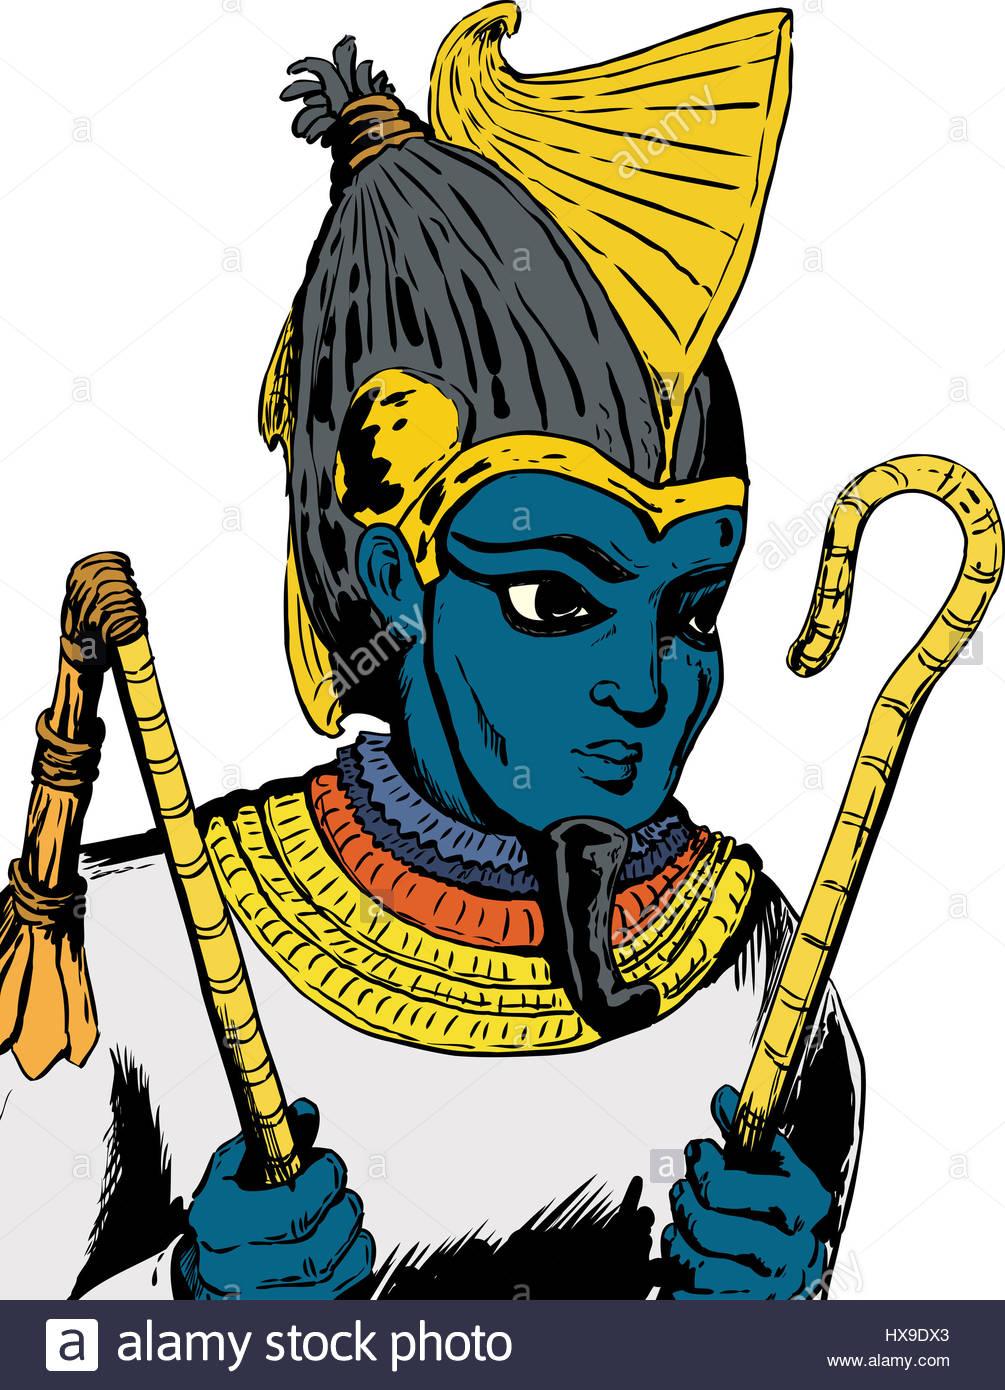 1005x1390 Illustration Of Osiris, The Egyptian God, Holding His Crook